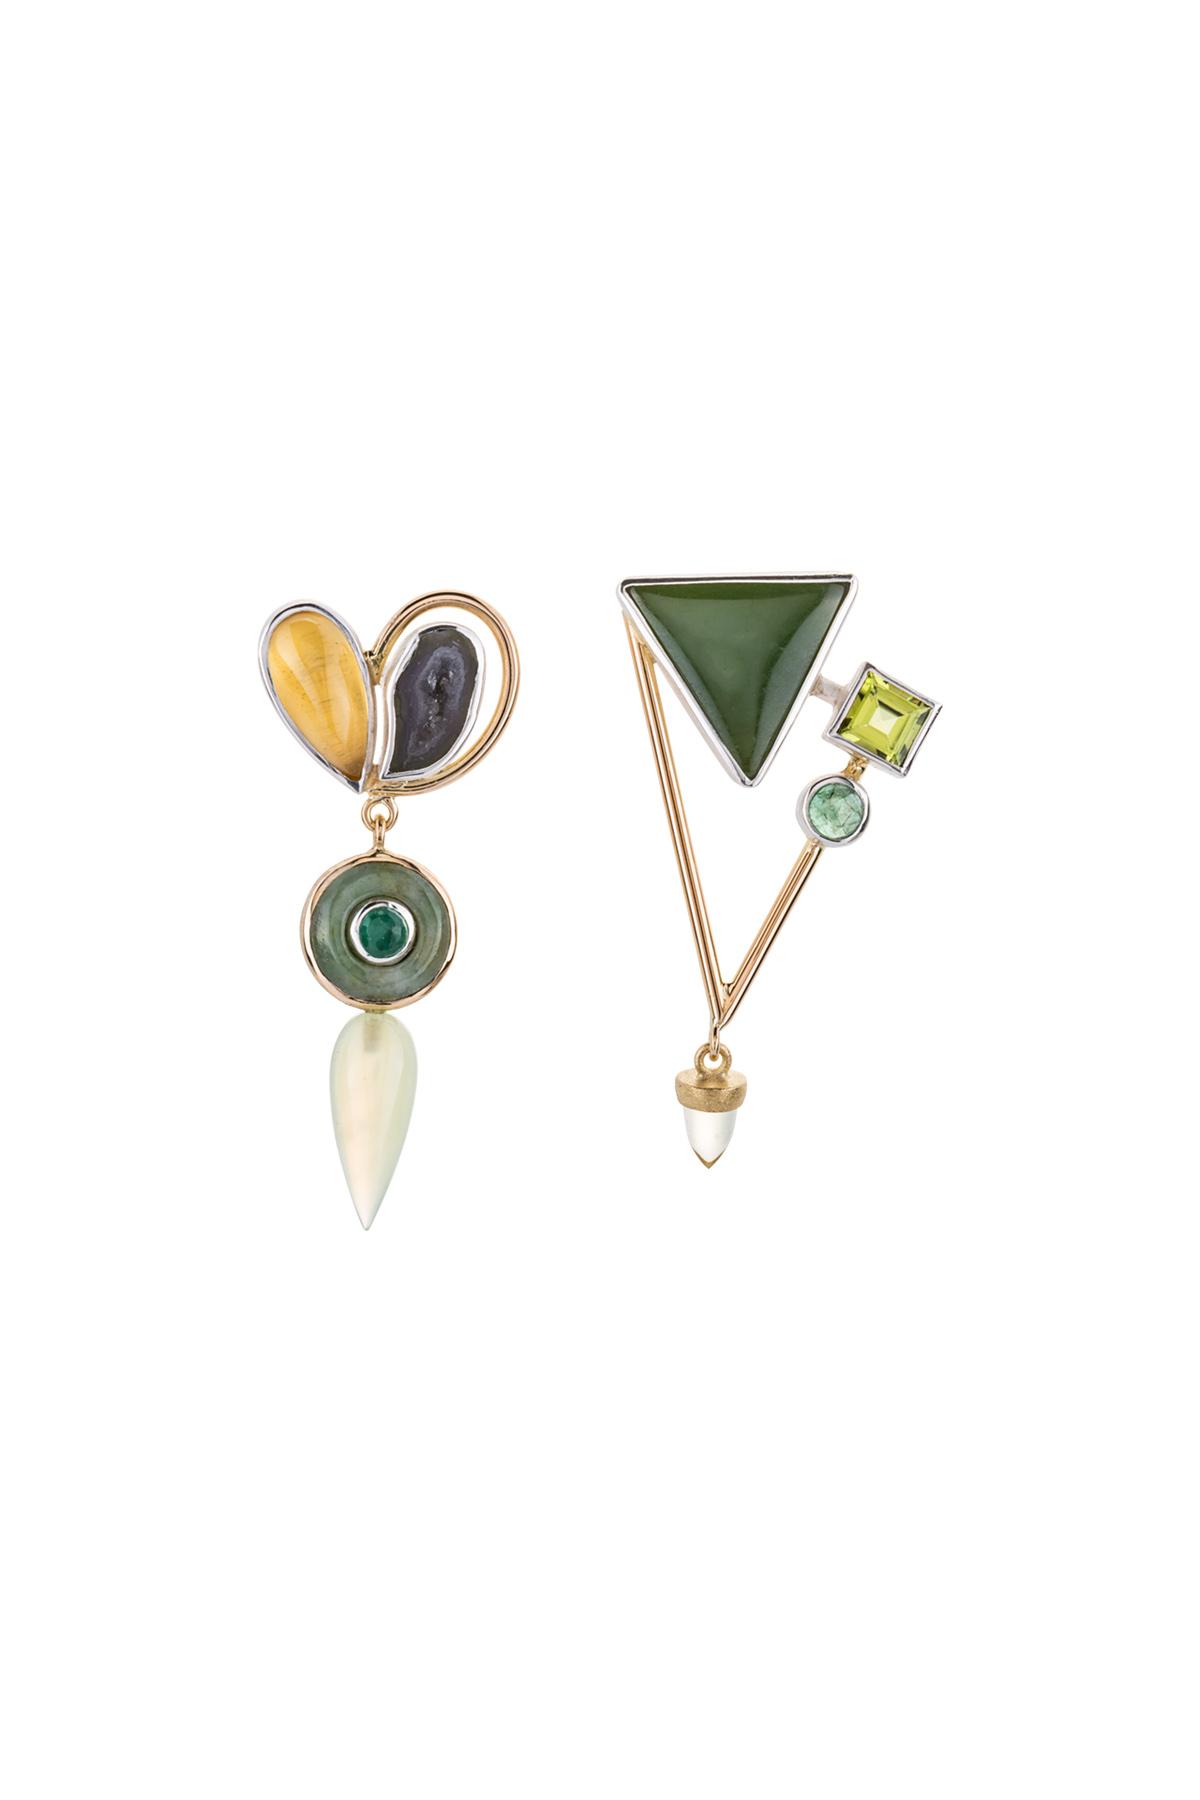 Sterling silver, 18kt yellow gold, beryl, drusy crystal, jade, emerald, peridot, jade, aventurine, serpentine 2016